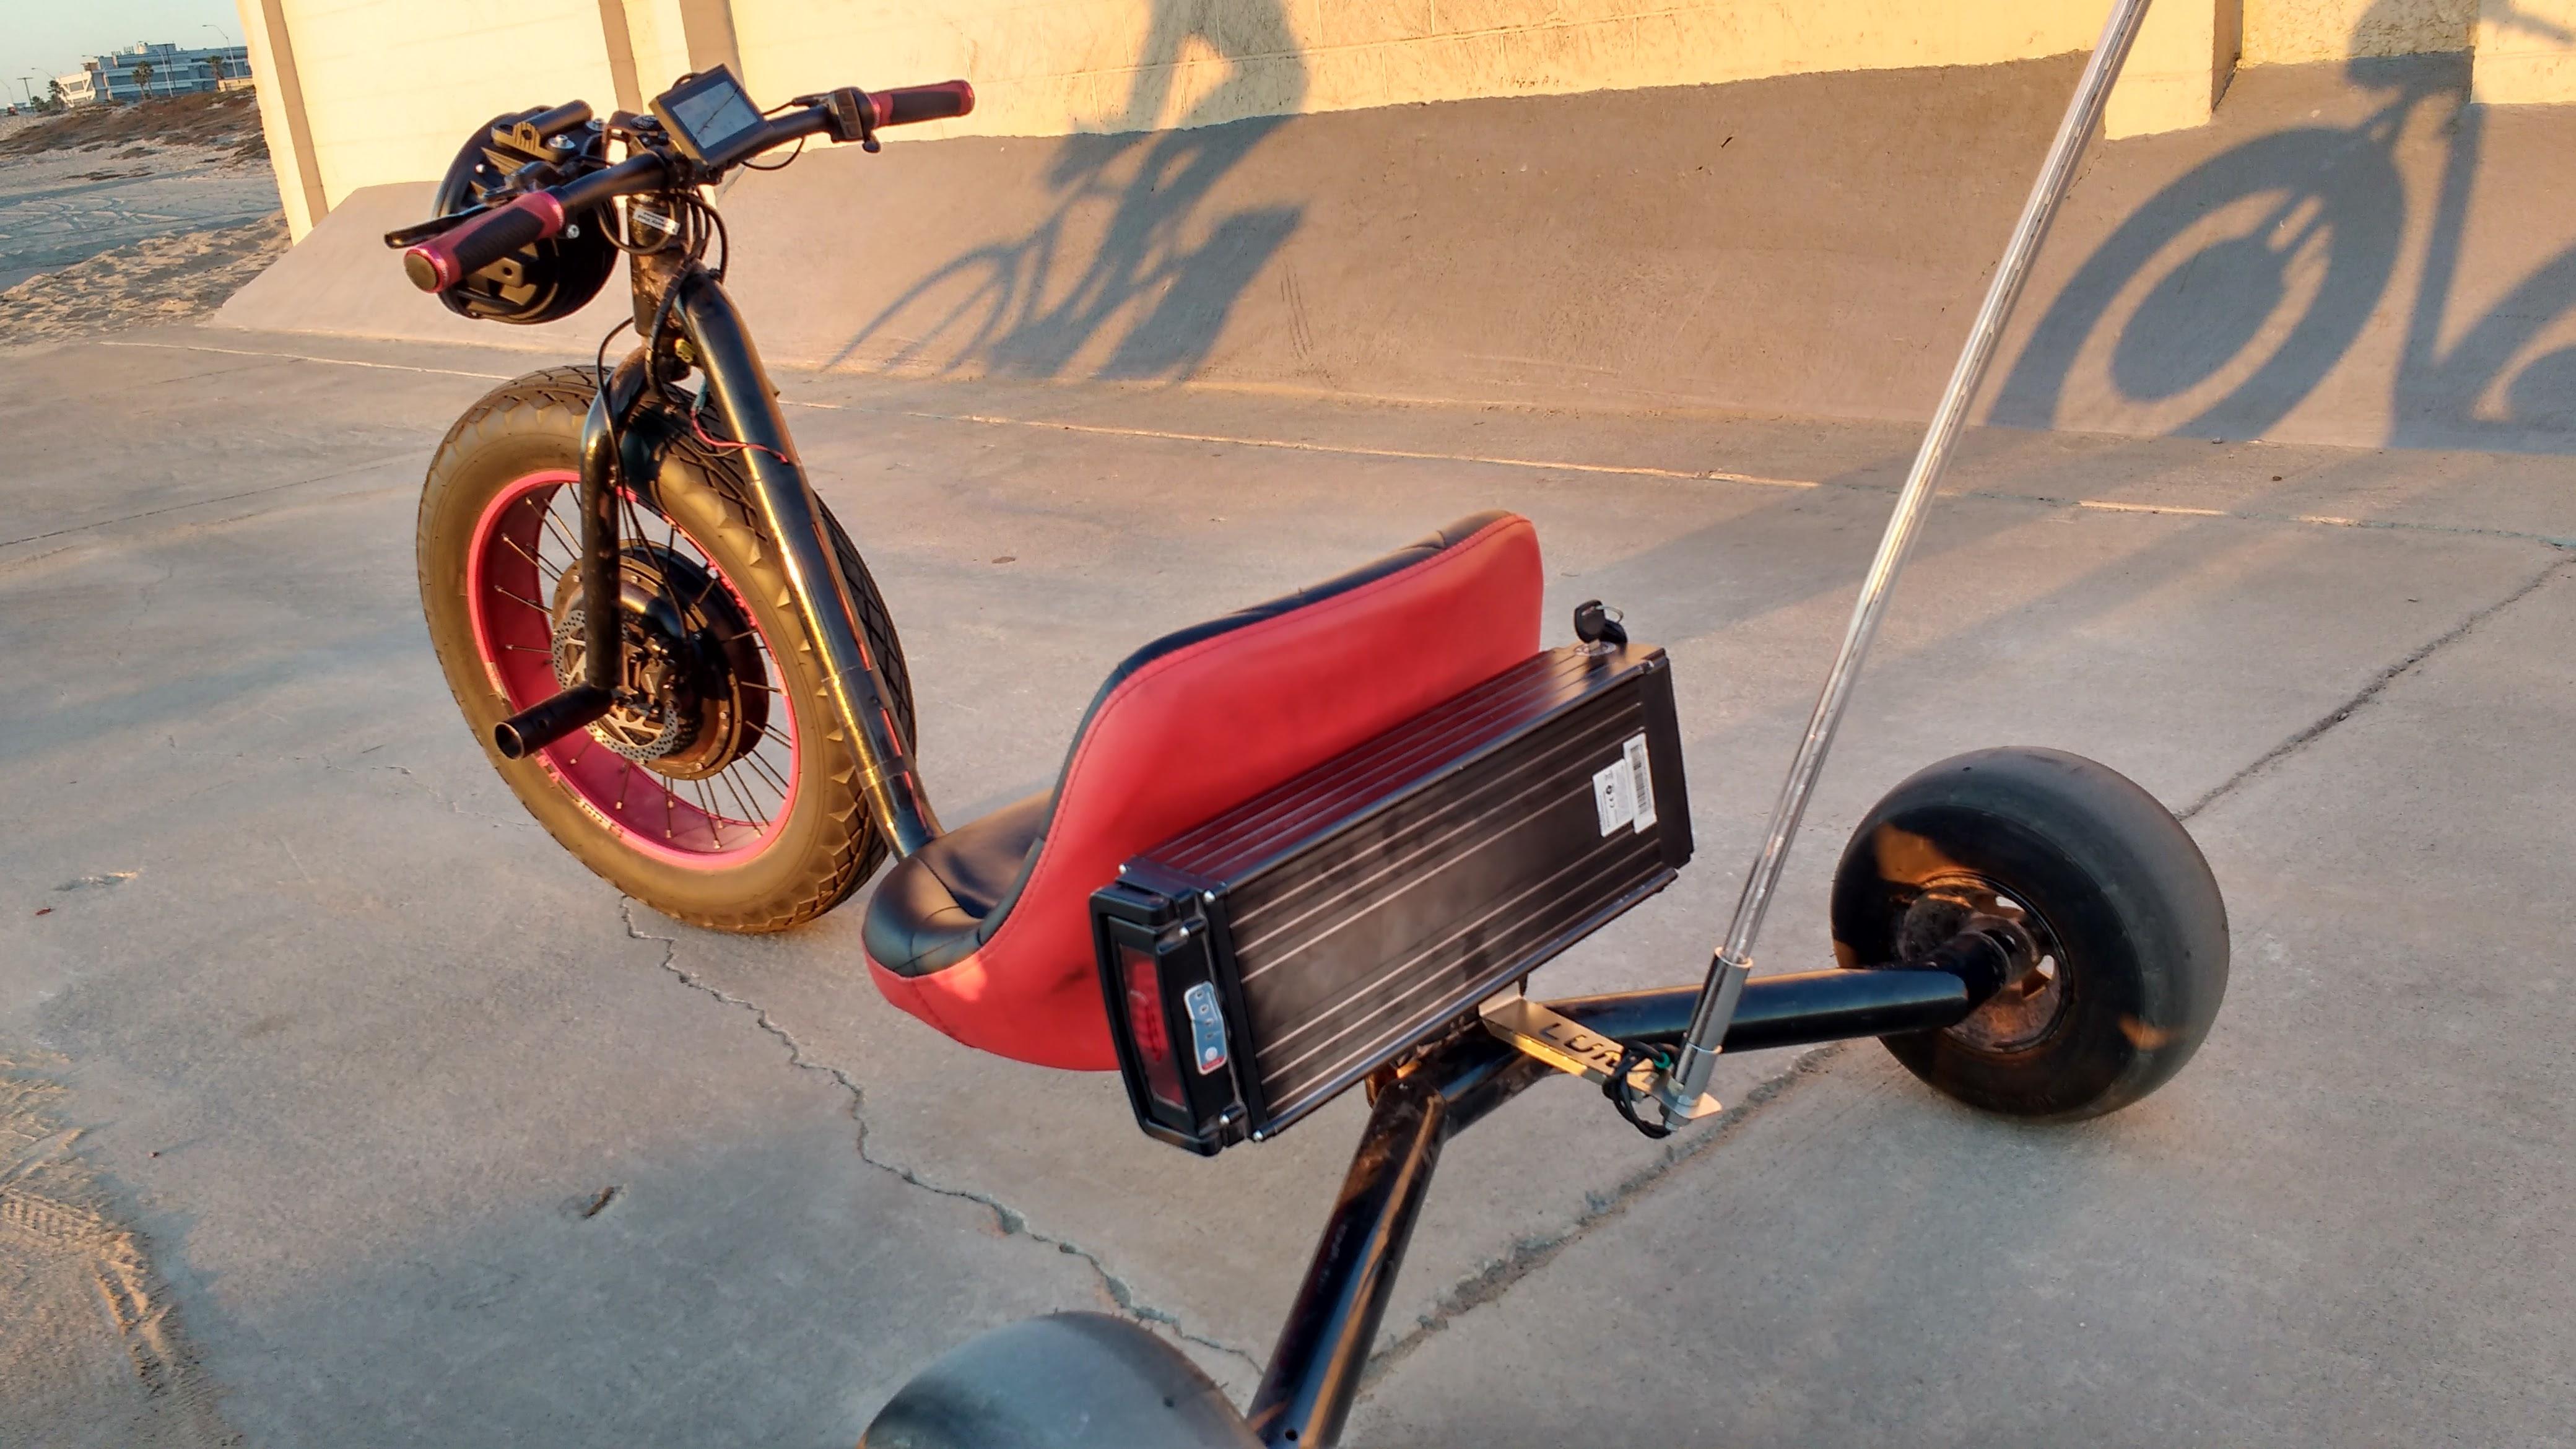 Diy Drift Trike Kit Buy Clothes Shoes Online